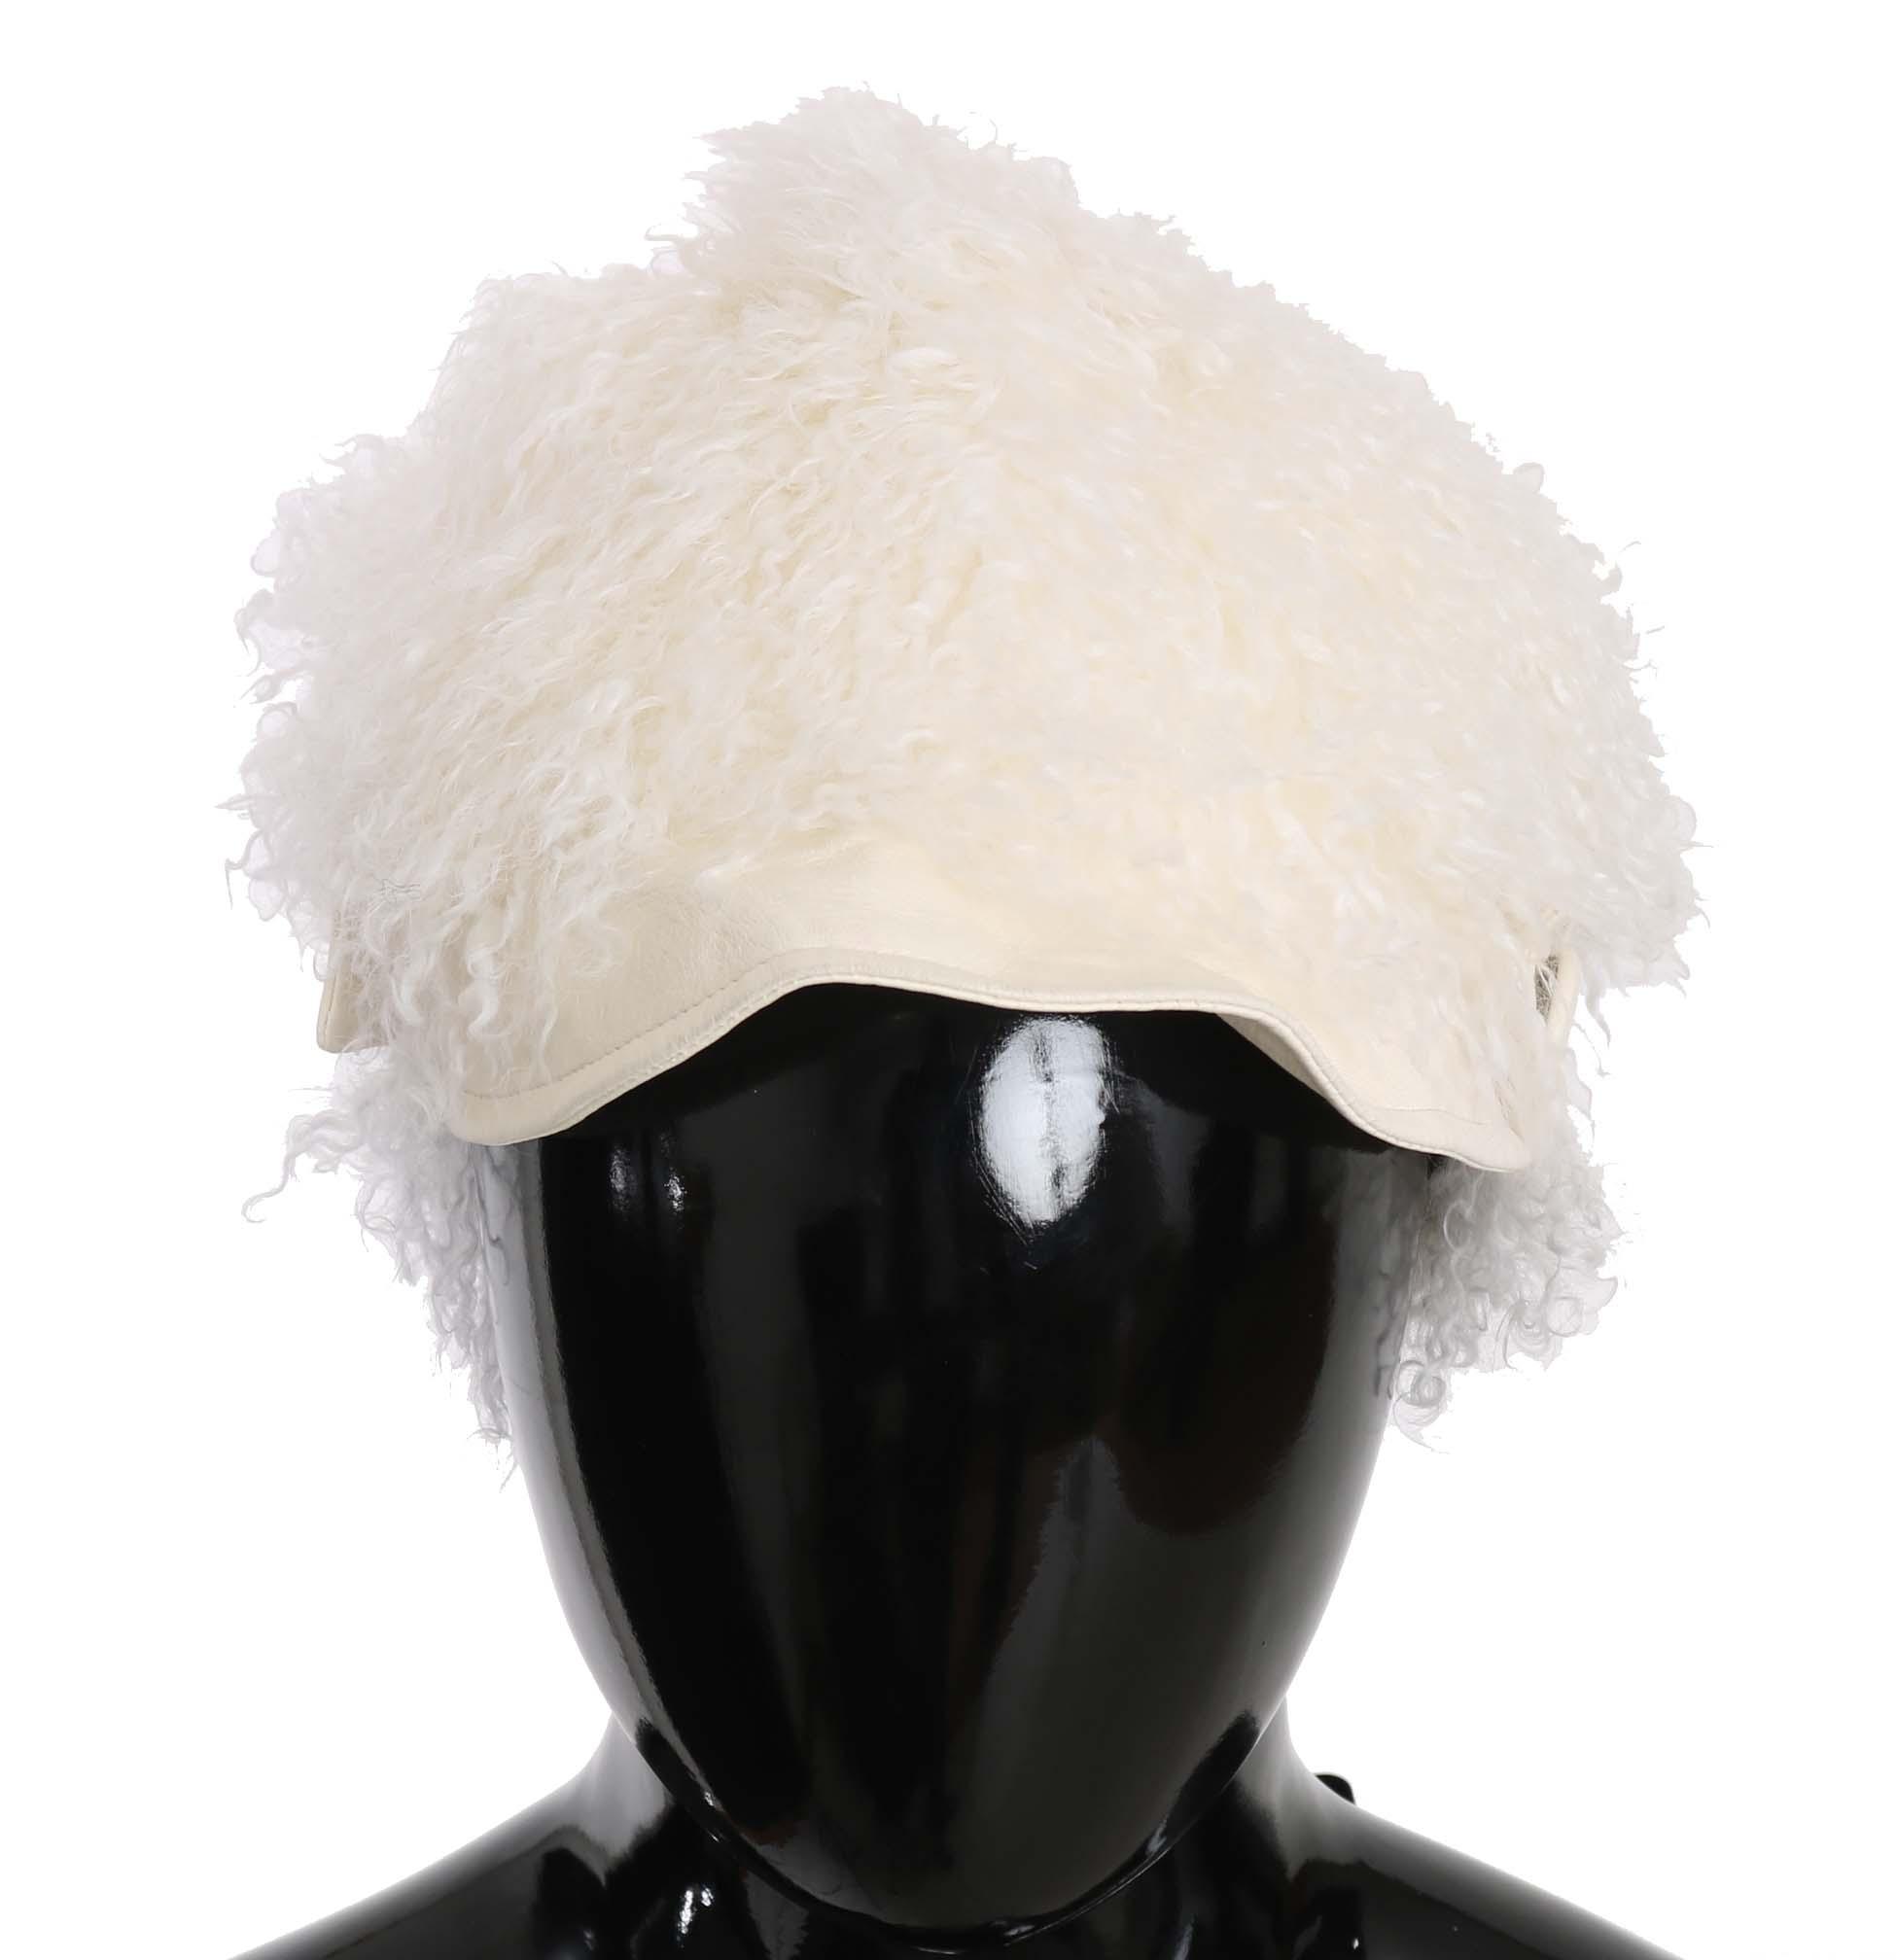 Dolce & Gabbana Women's Tibet Lamb Fur Gatsby Hat Beige HAT70207 - 56 cm|XS